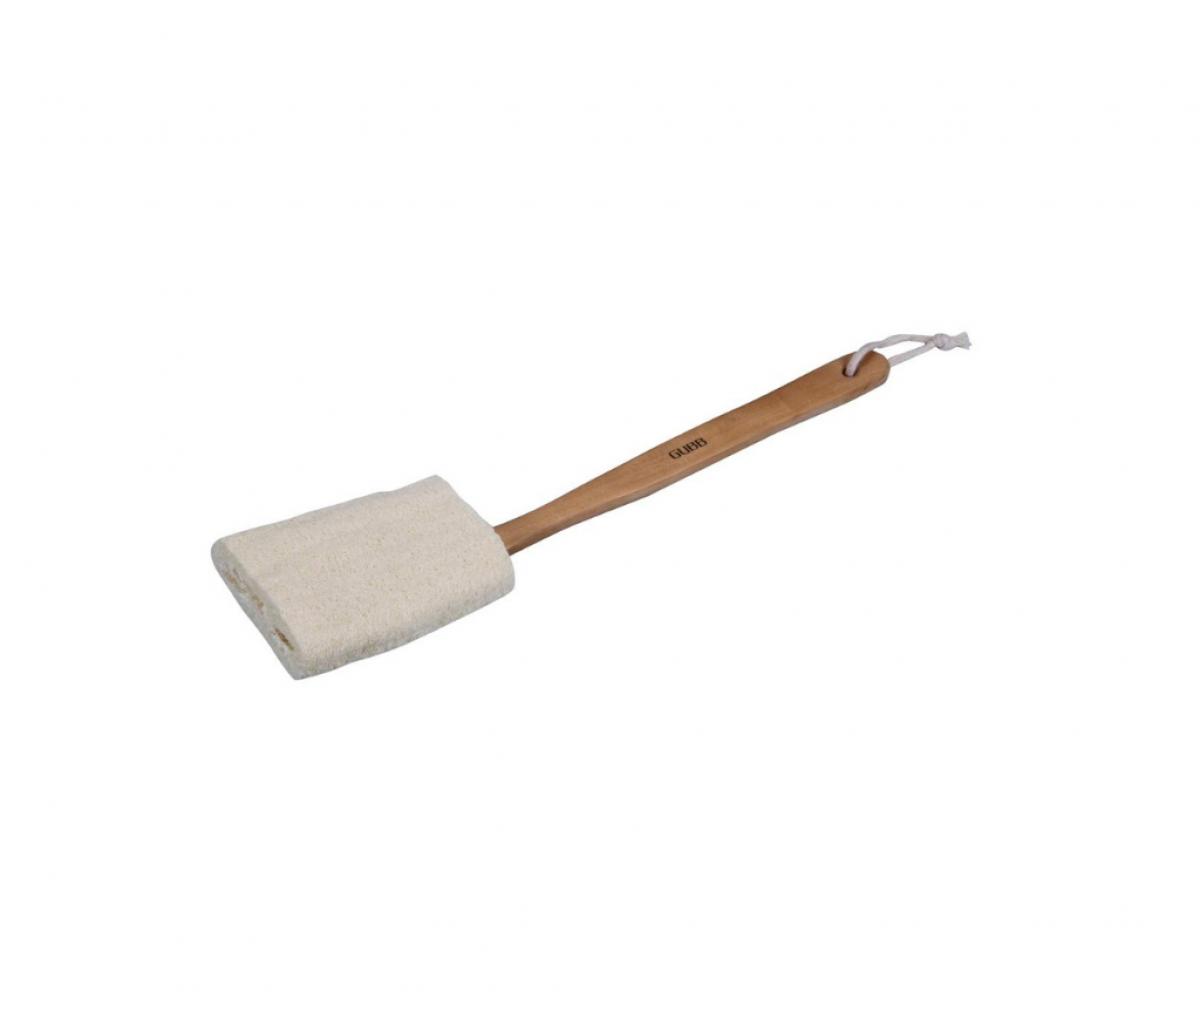 GUBB Natural Loofah Brush (With Detachable Handle)